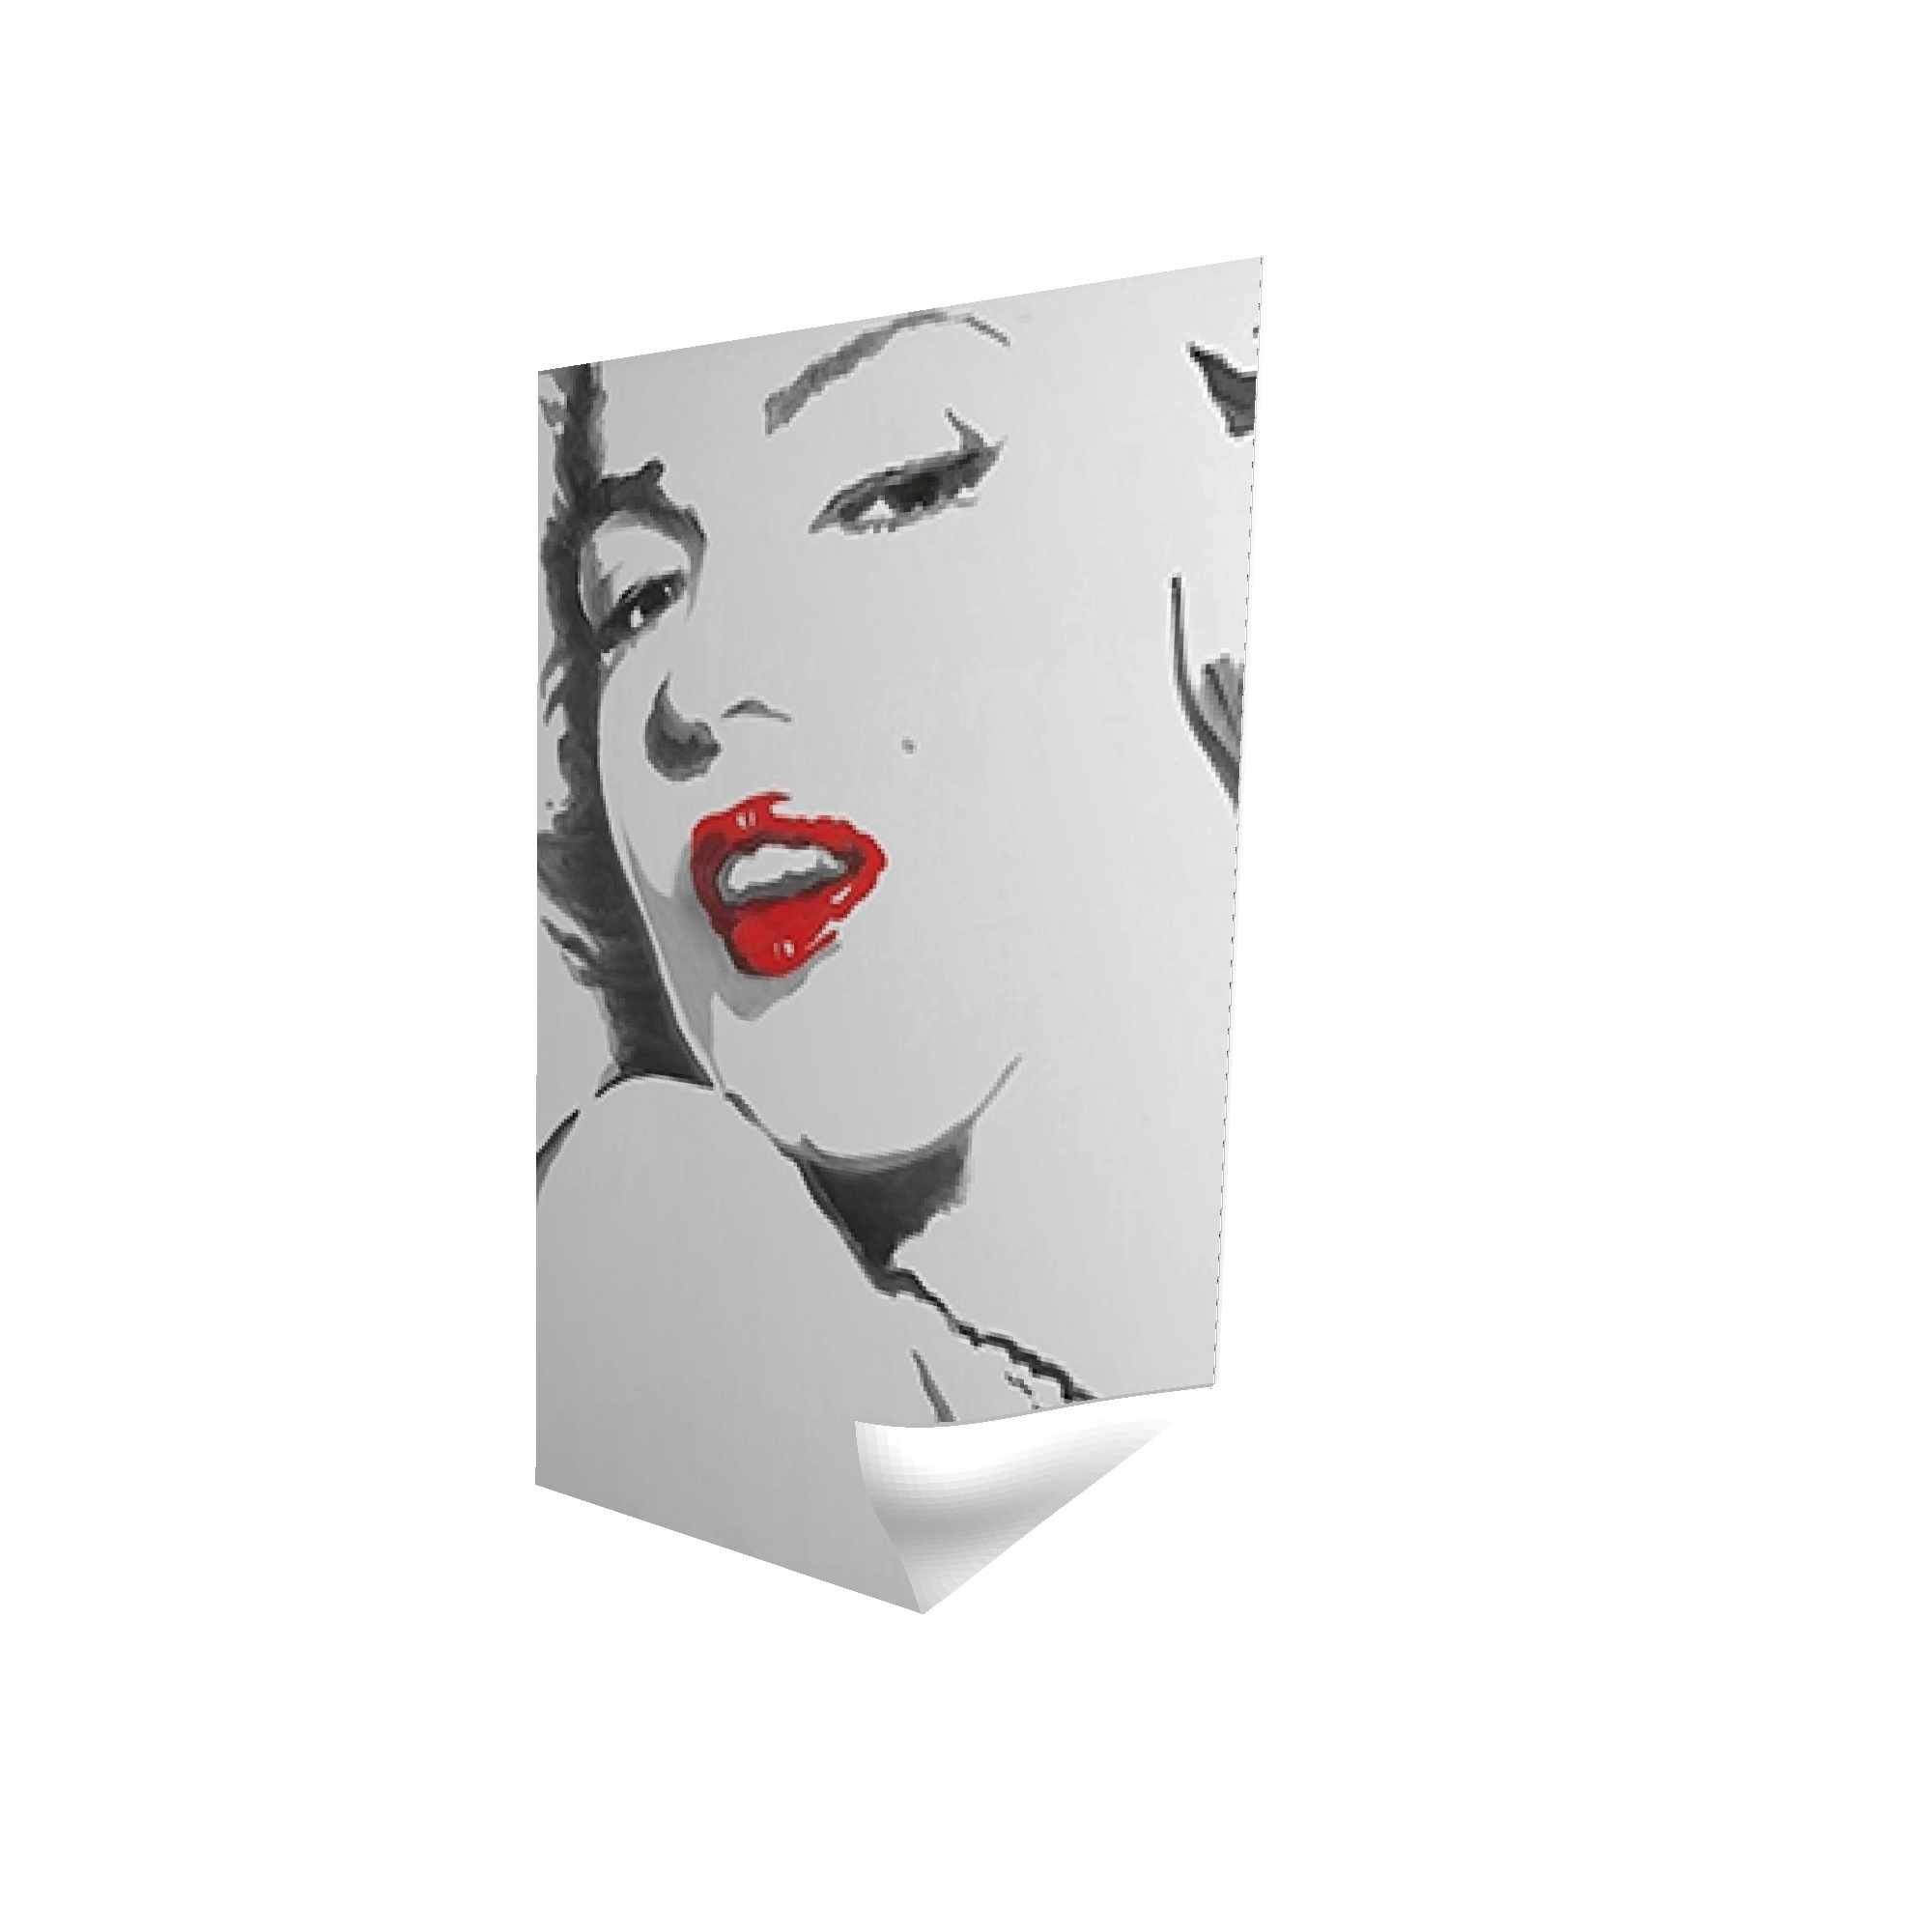 Marilyn monroe outline style